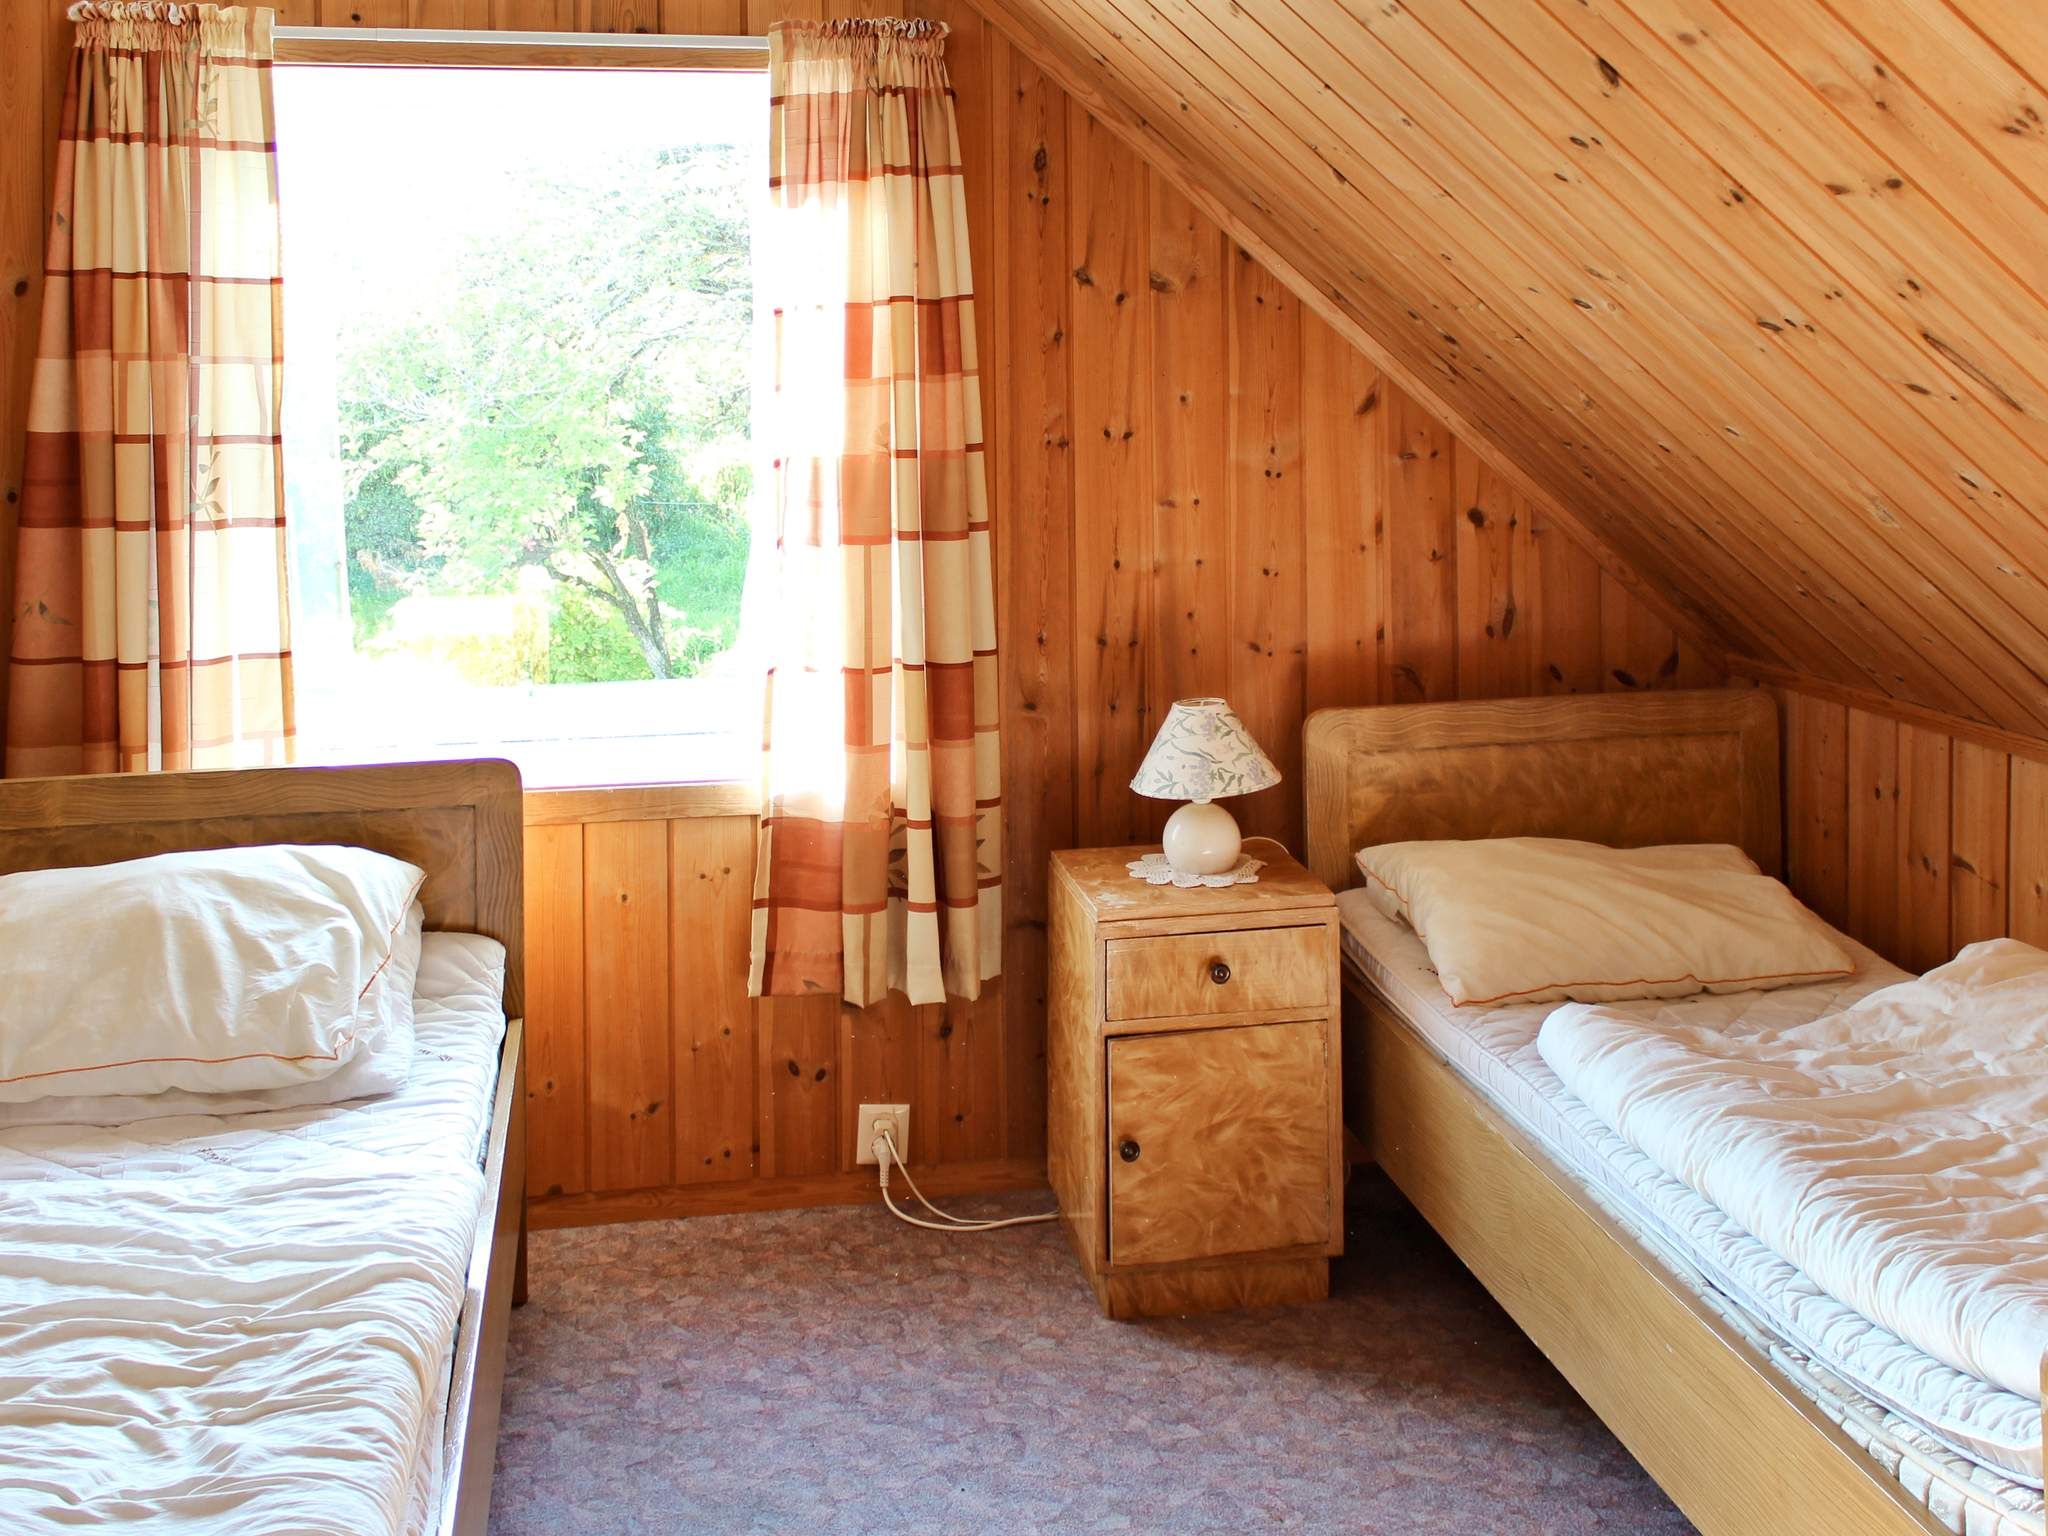 Ferienhaus Vevang (85080), Vevang, More - Romsdal, Westnorwegen, Norwegen, Bild 15